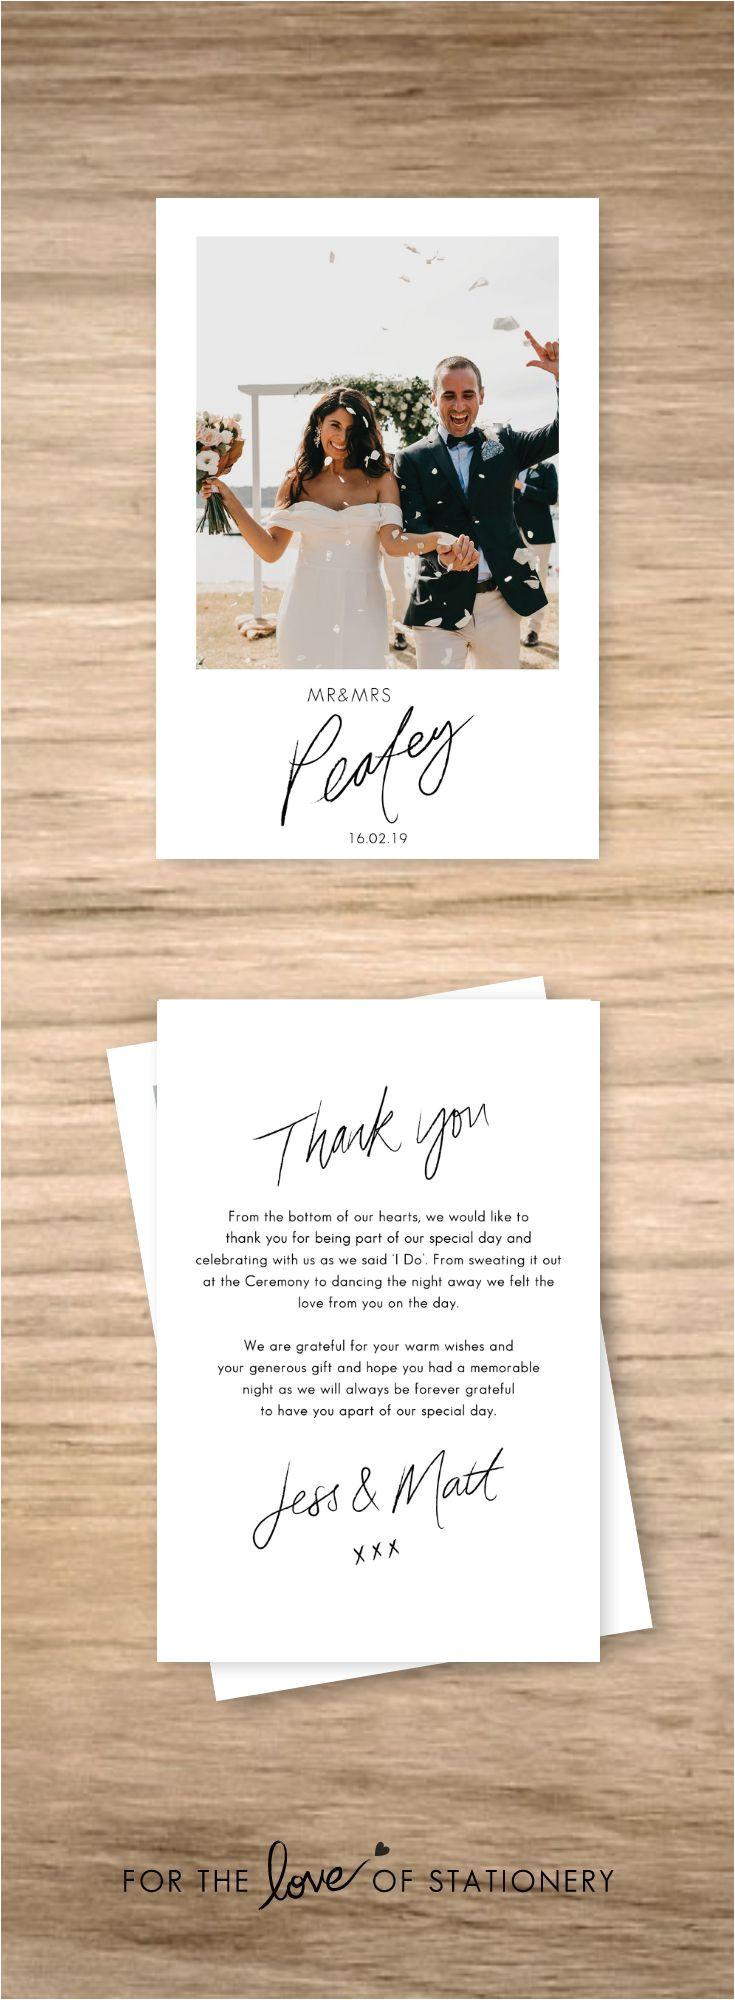 Wedding Thank You Card Wording Personalised Wedding Thank You Cards with Photos with